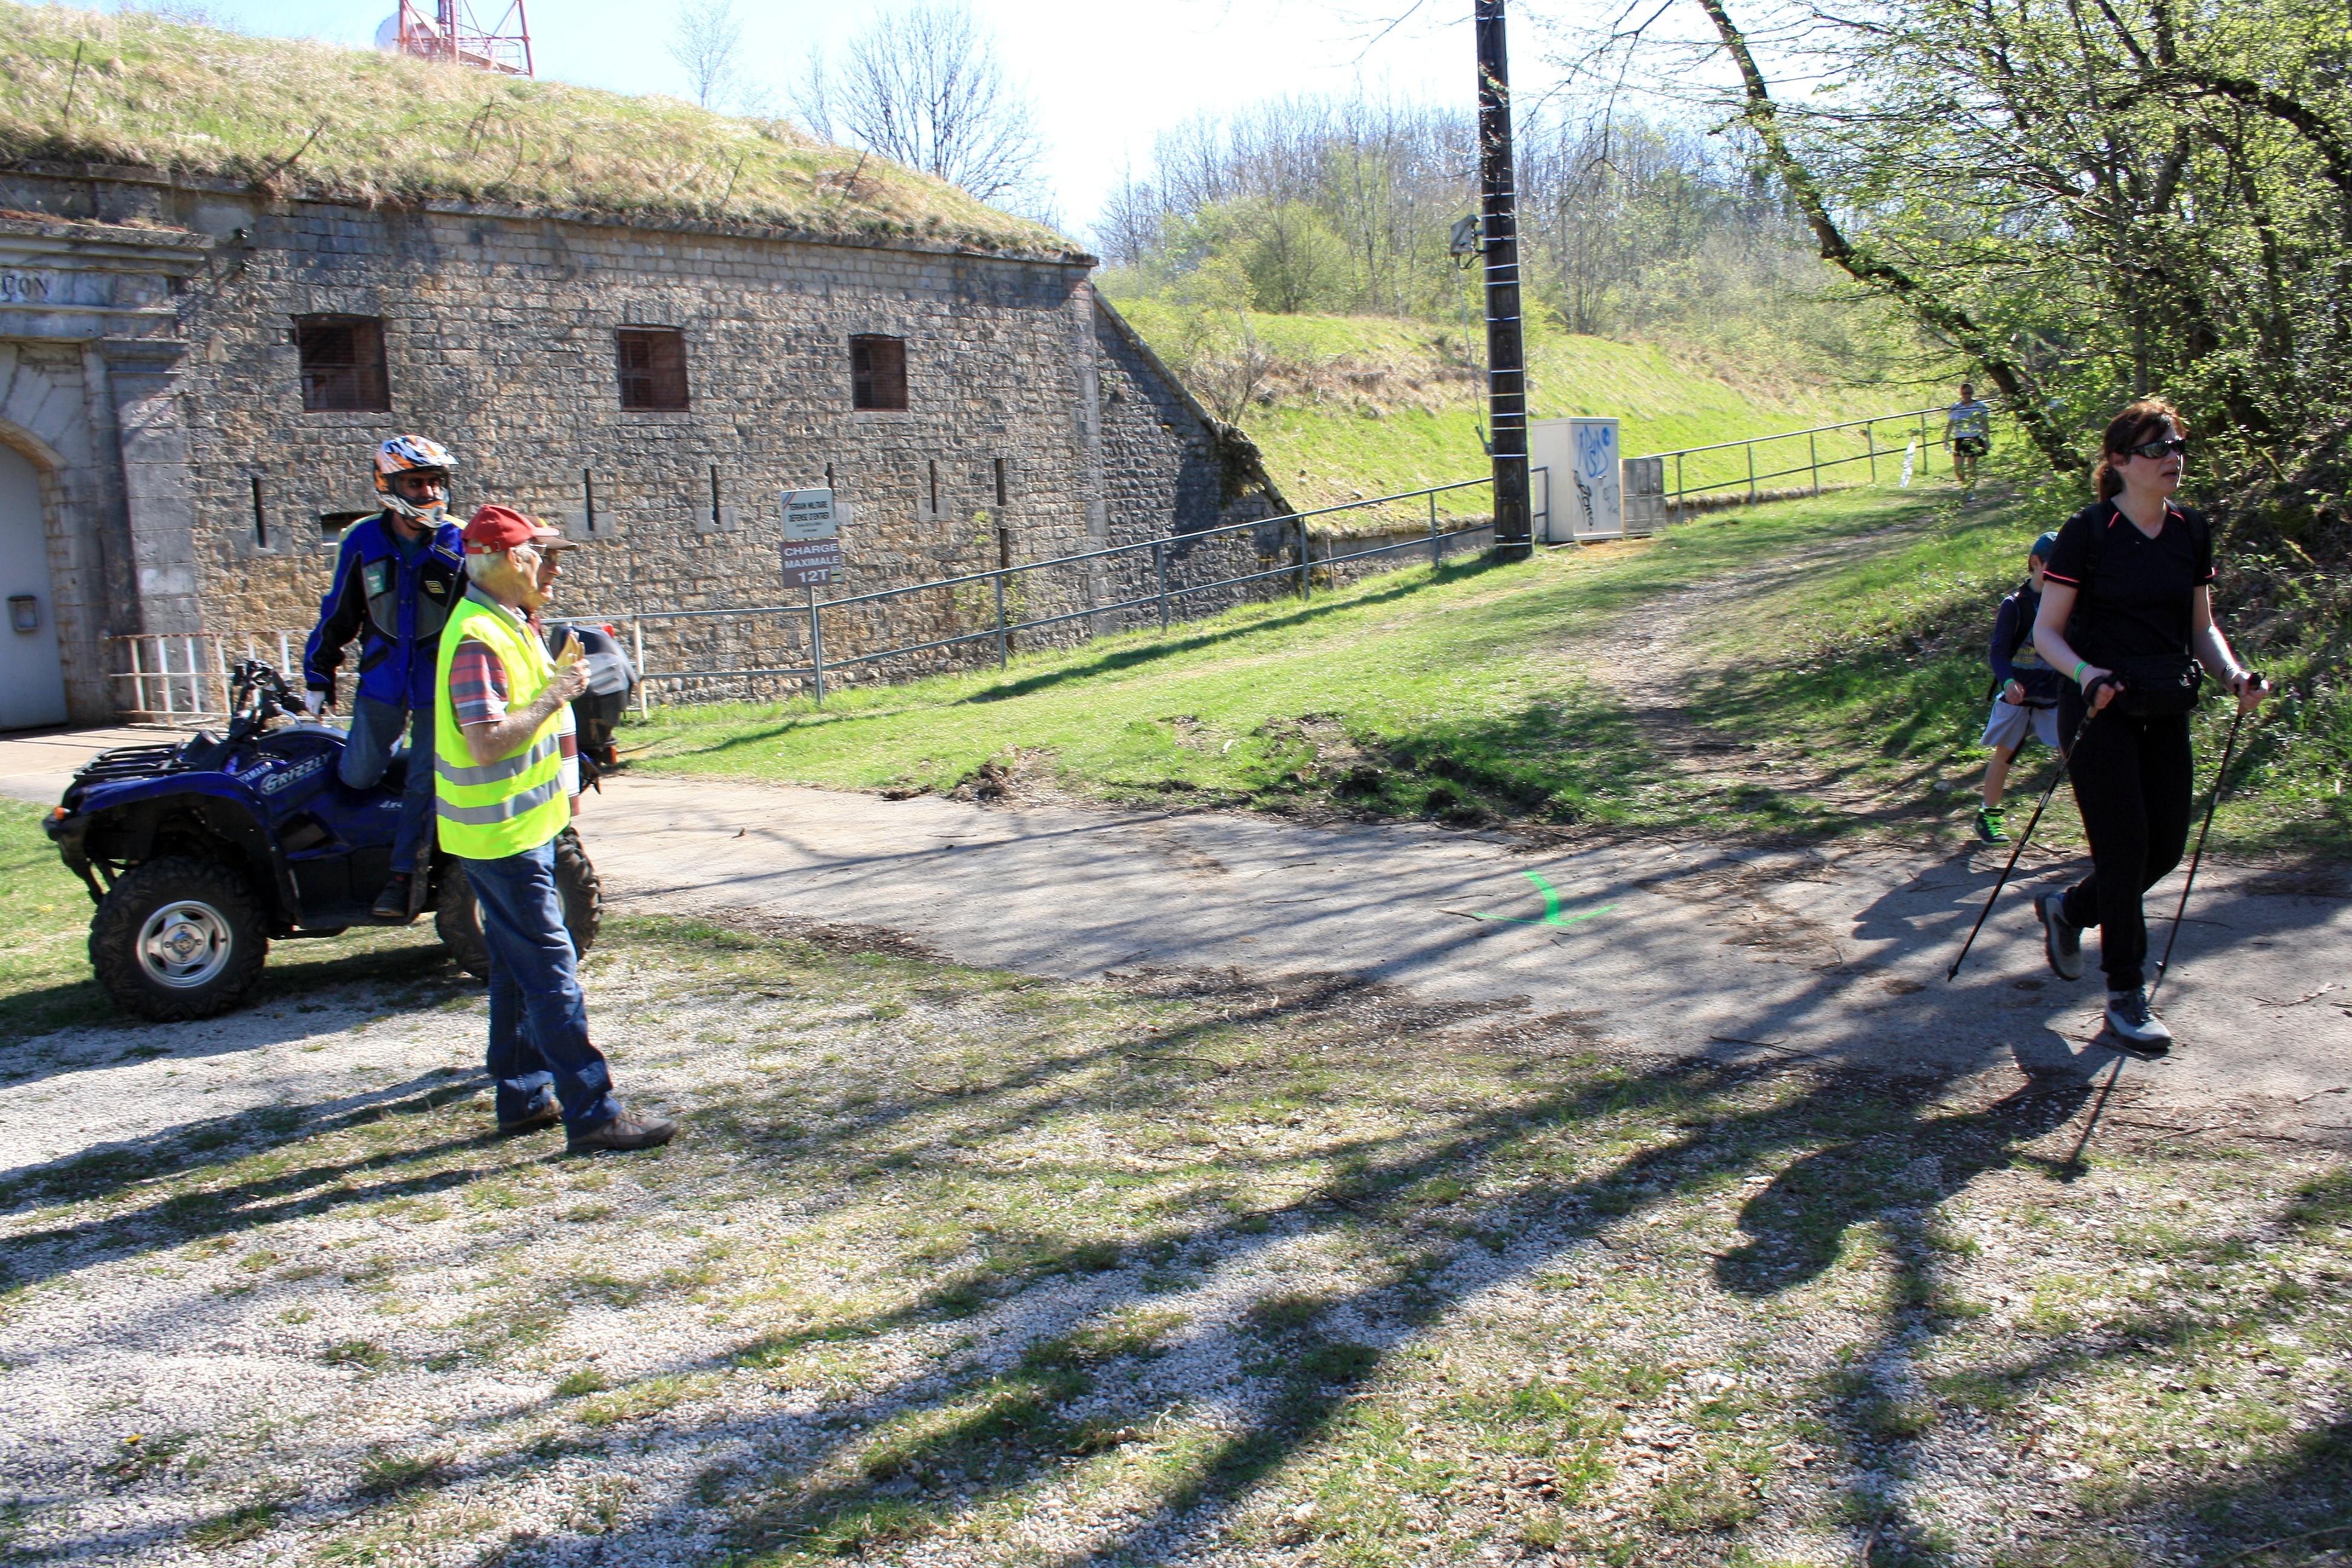 2017-04-09 - Trail-Montfaucon (282)